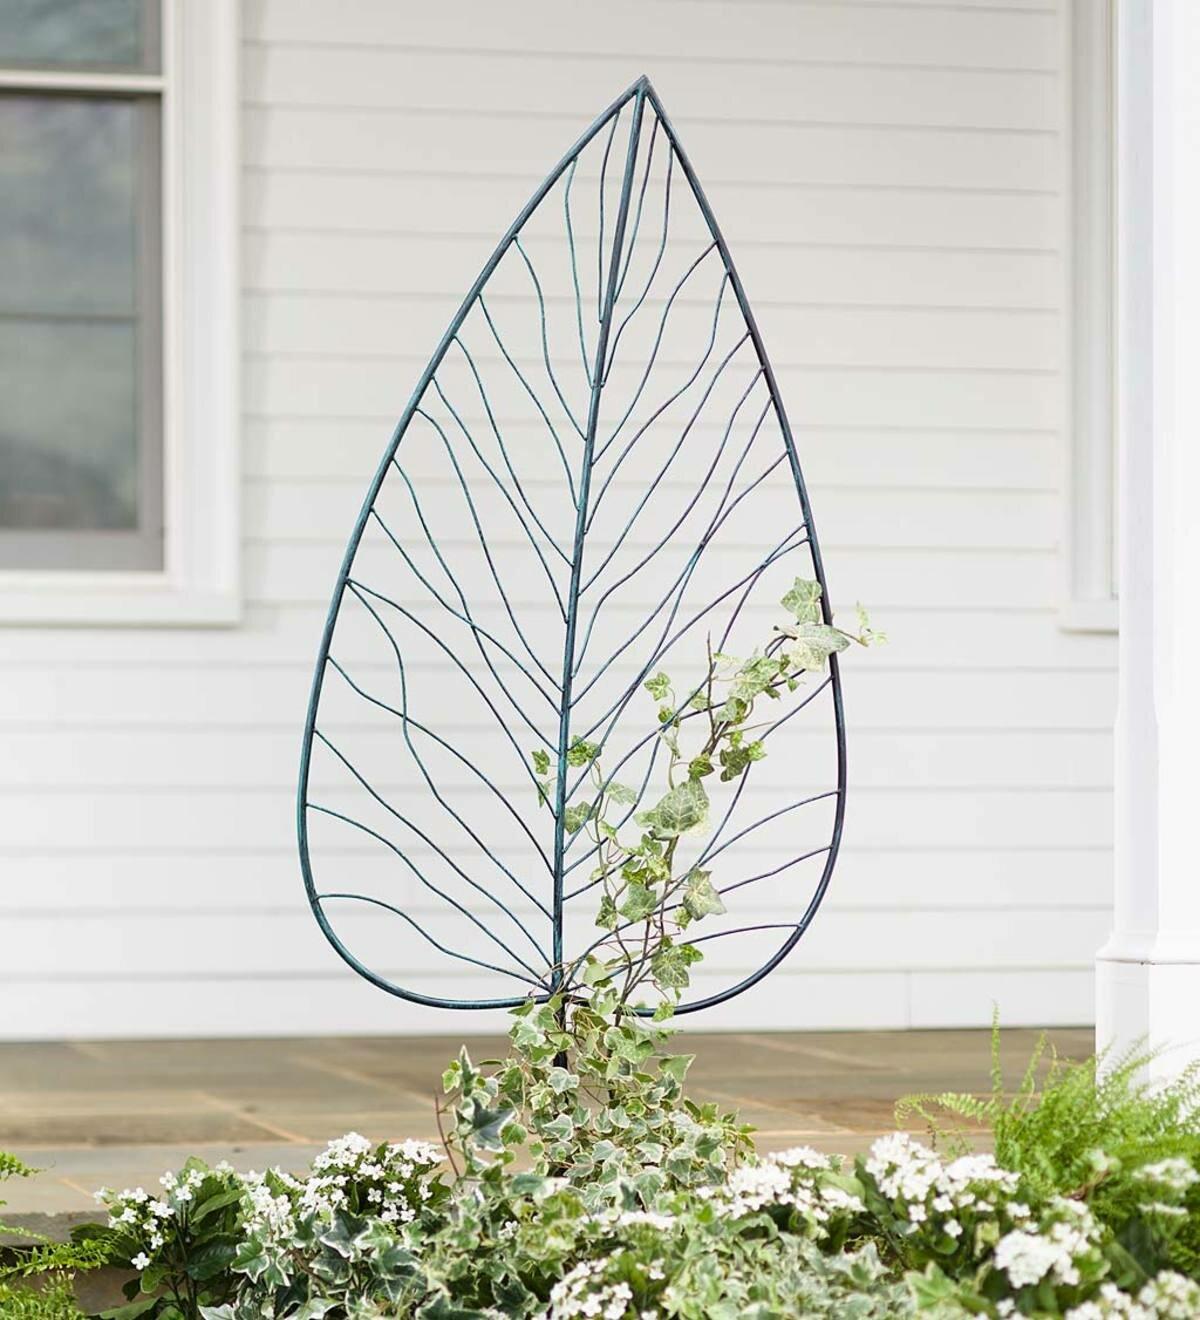 76 Small Wrought Iron Swirly Topiary Sundial Obelisk Trellis for Climbing Vines